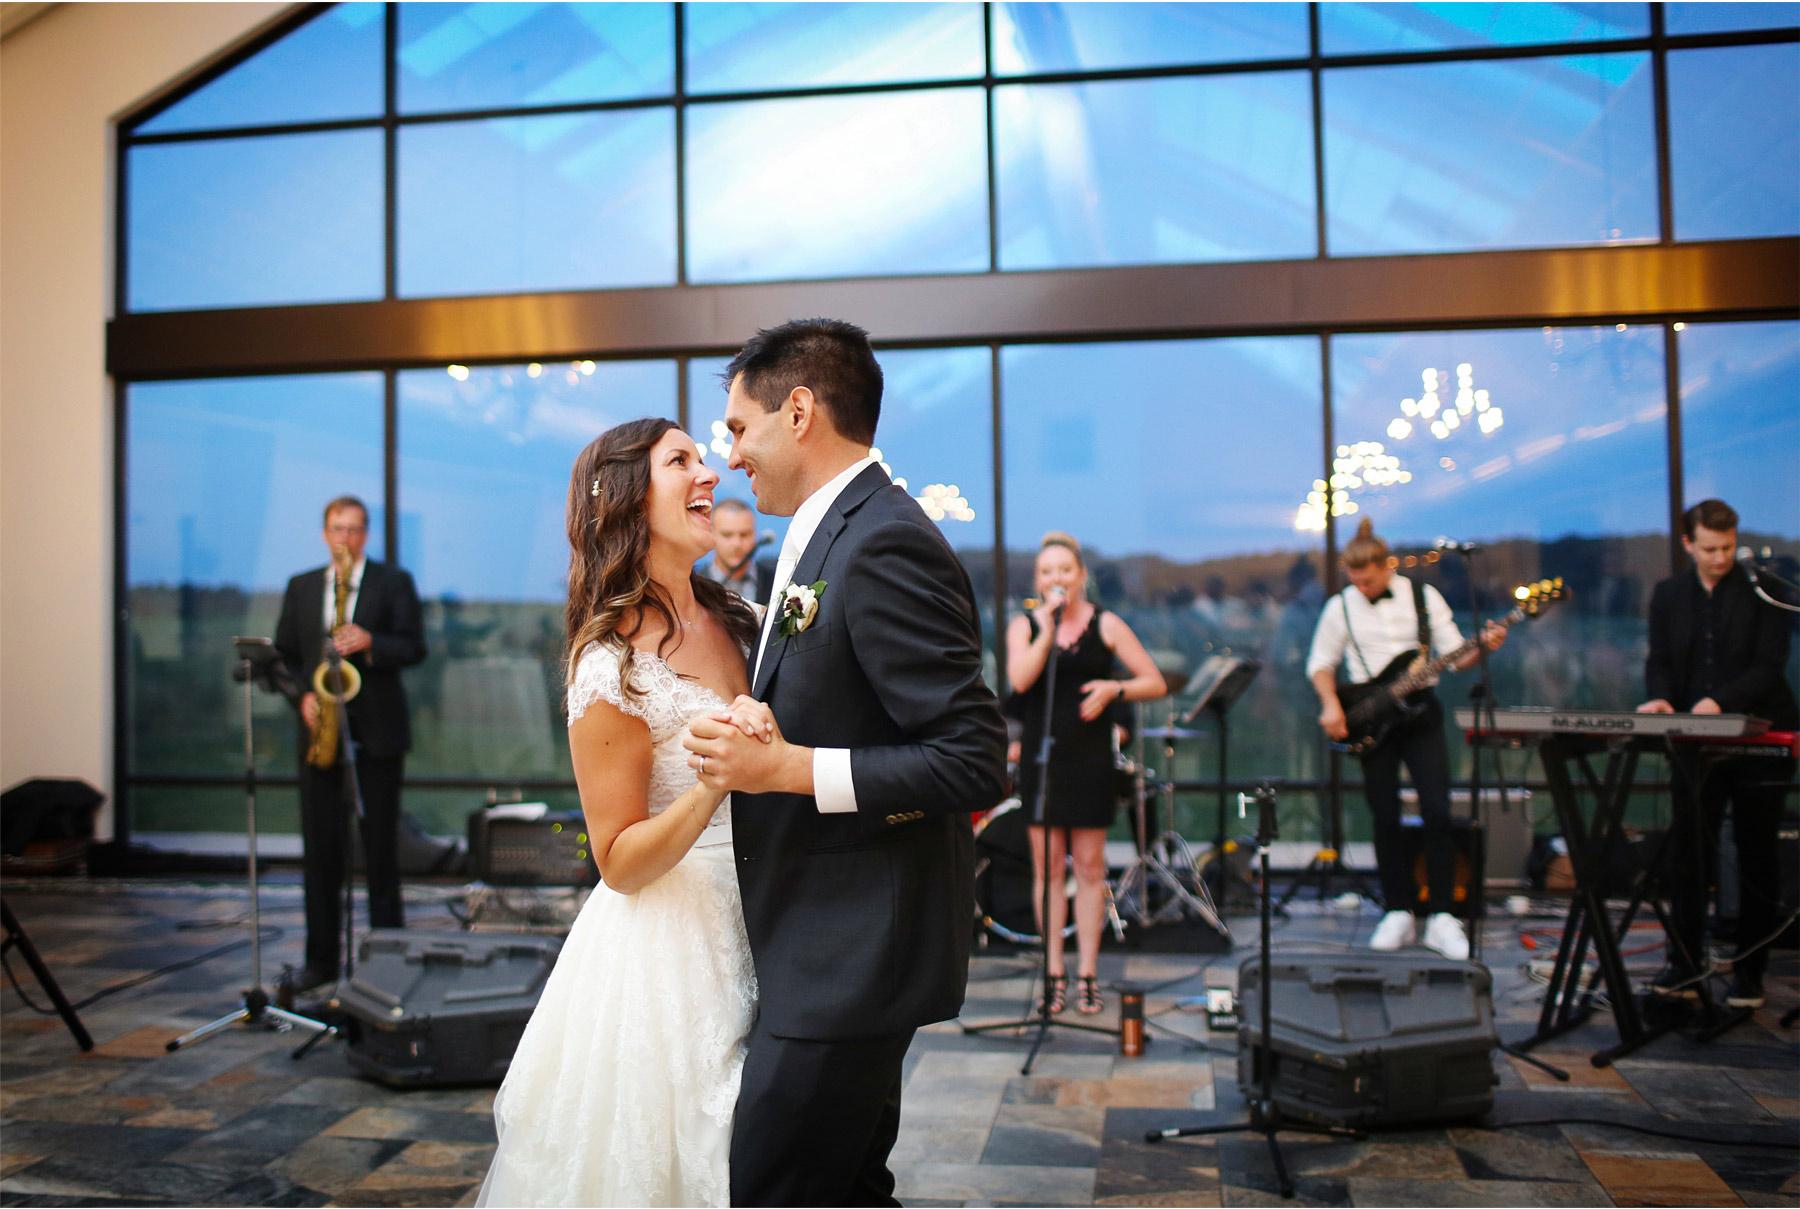 20-Weding-by-Vick-Photography-Minneapolis-Minnesota-Bavaria-Downs-Reception-Bride-Groom-Dance-Rebecca-and-Mark.jpg